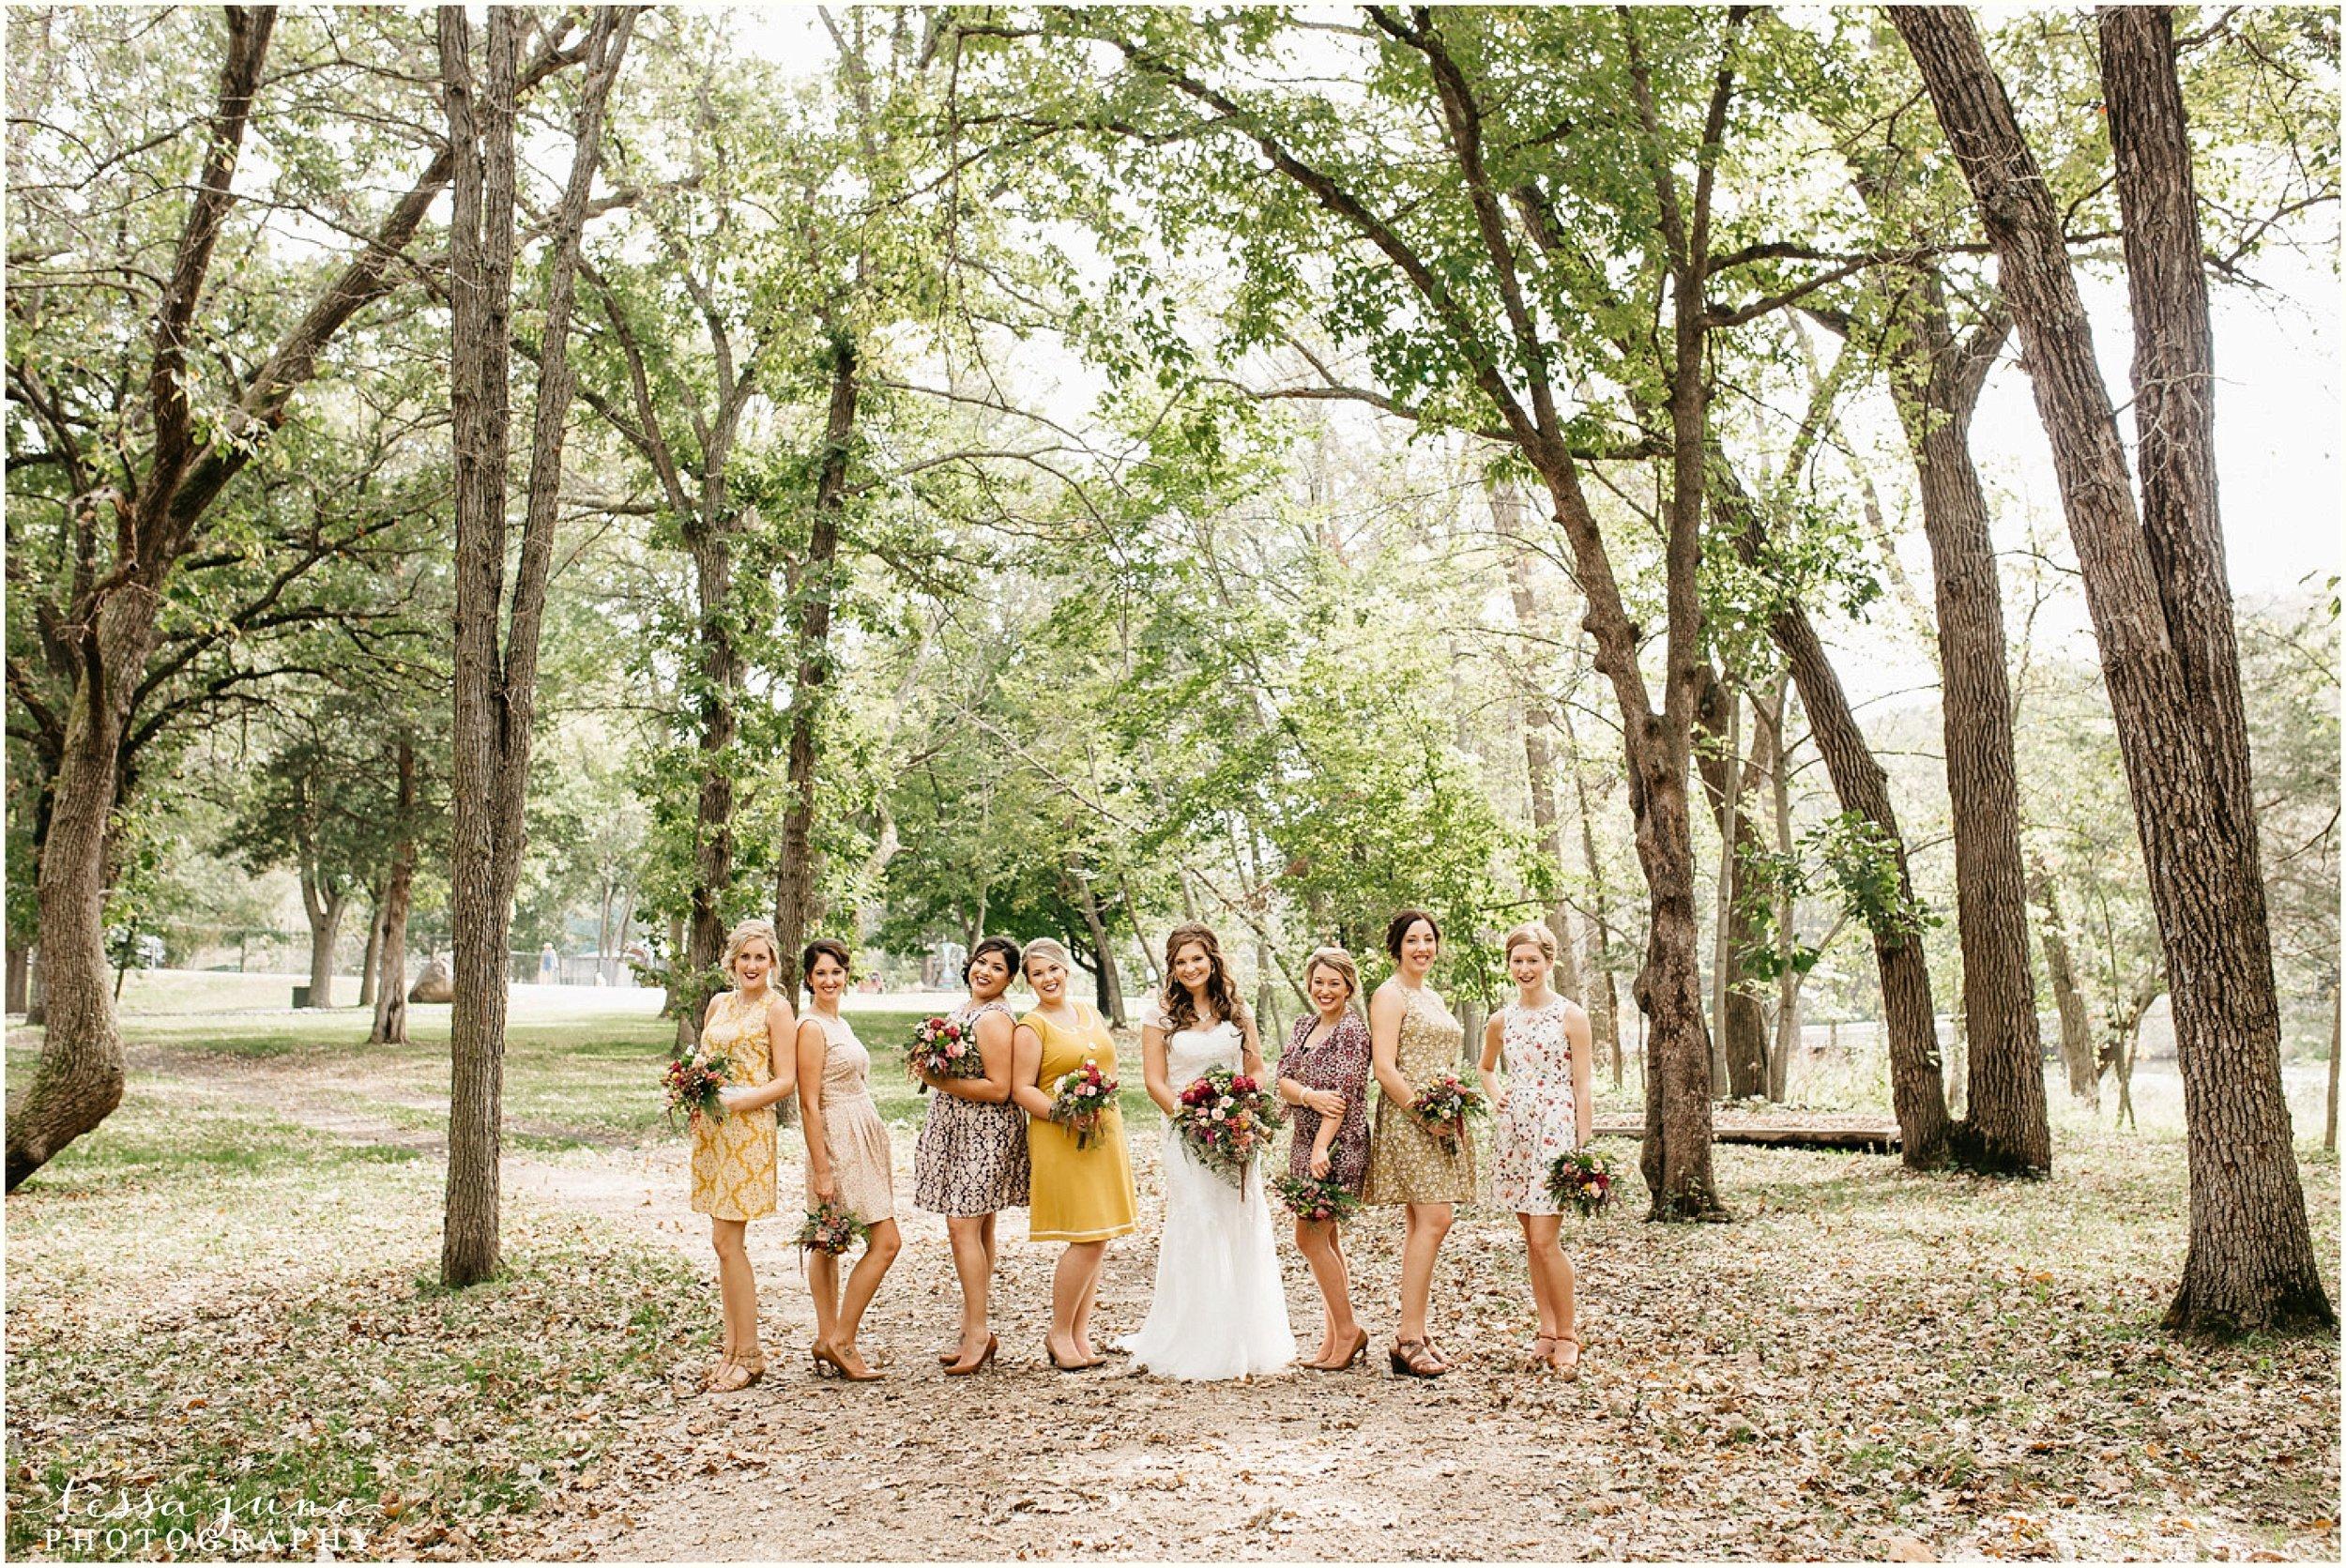 bohemian-minnesota-wedding-mismatched-bridesmaid-dresses-waterfall-st-cloud-tessa-june-photography-80.jpg